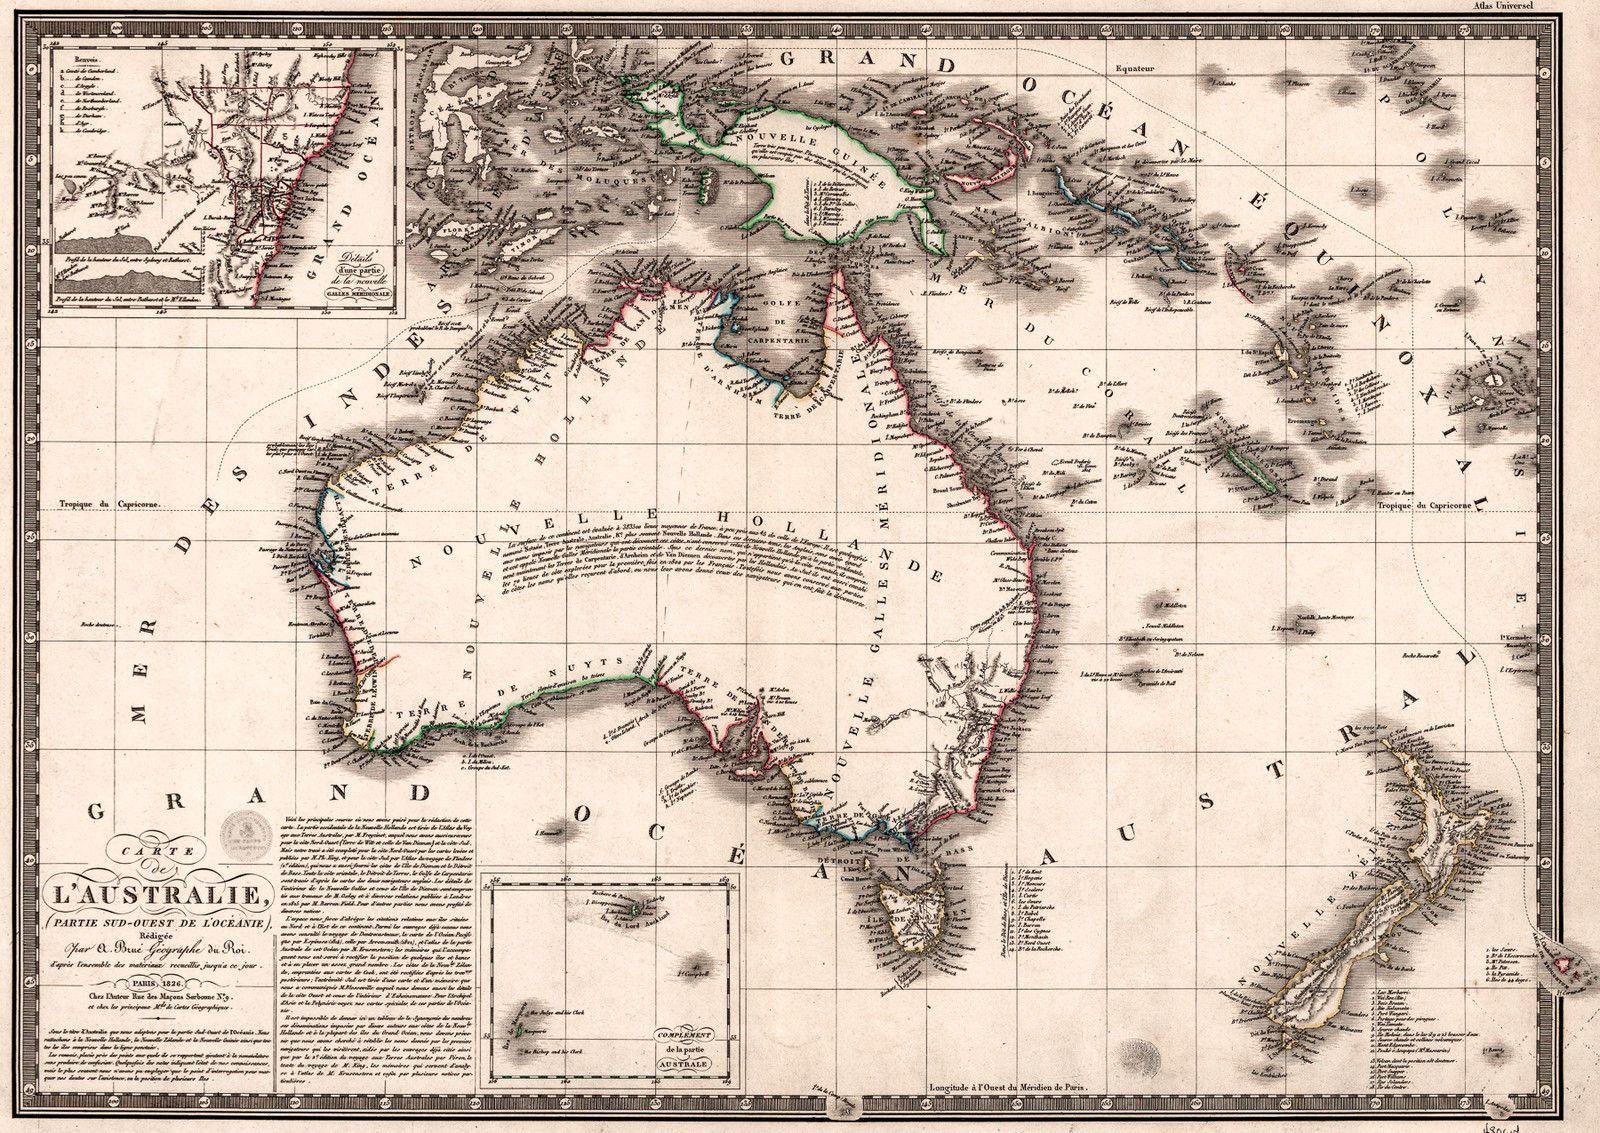 Antique Map Of Australia Old Vintage 1826 Fade Resistant Hd Print Or Canvas Mapa De Australia Arte De Mapa Mural Mapa Antiguo